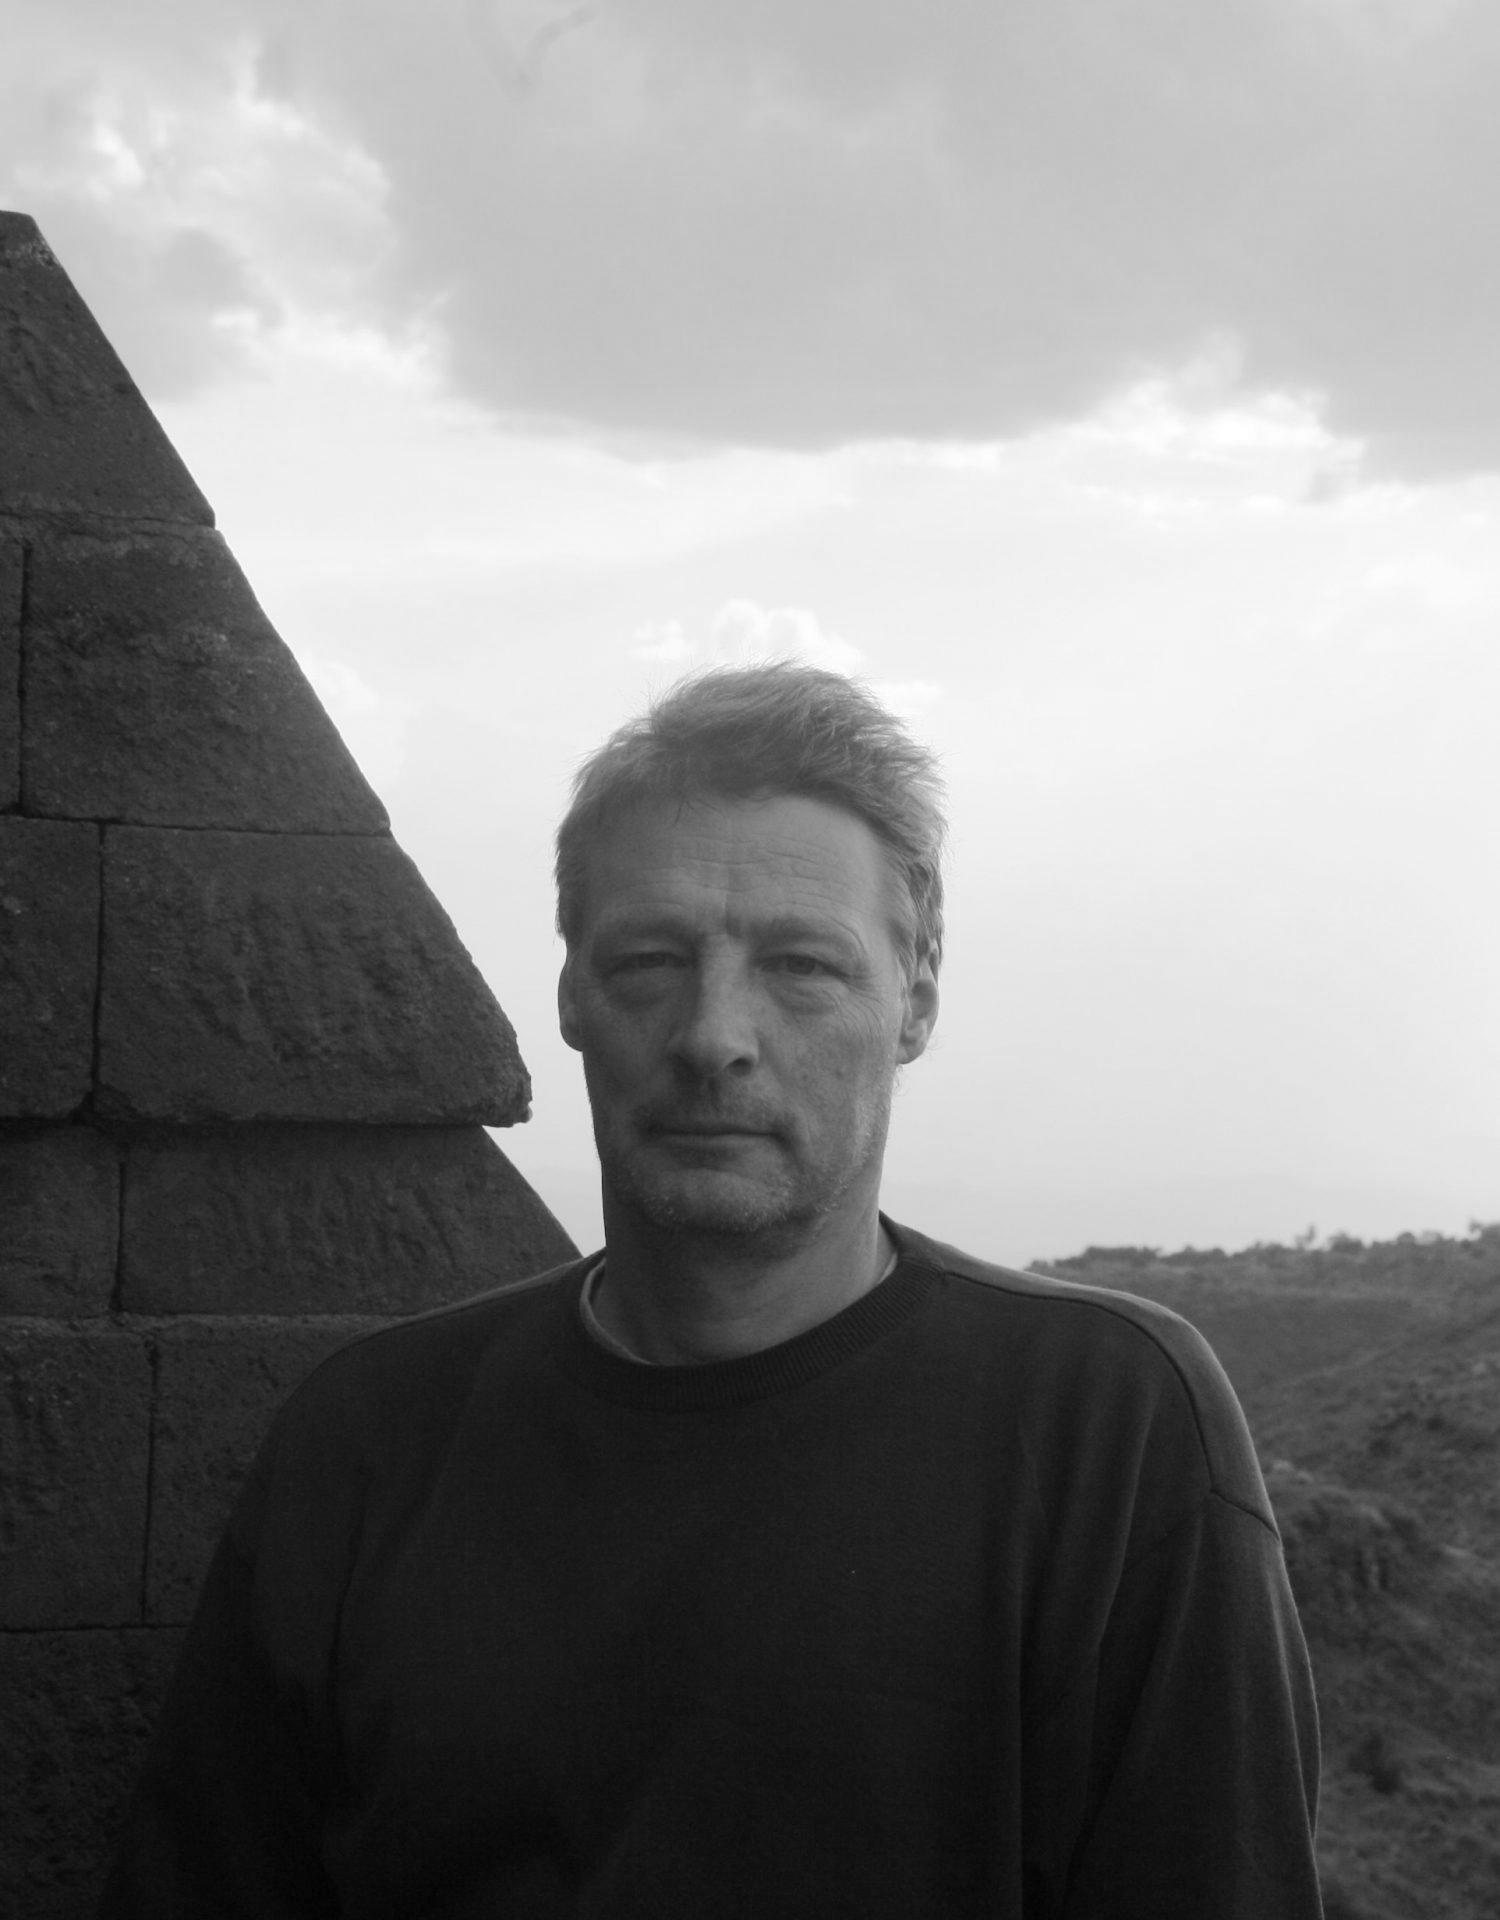 Dieter Jüngling<br>Dipl. Arch. BSA/SIA <br>Chur